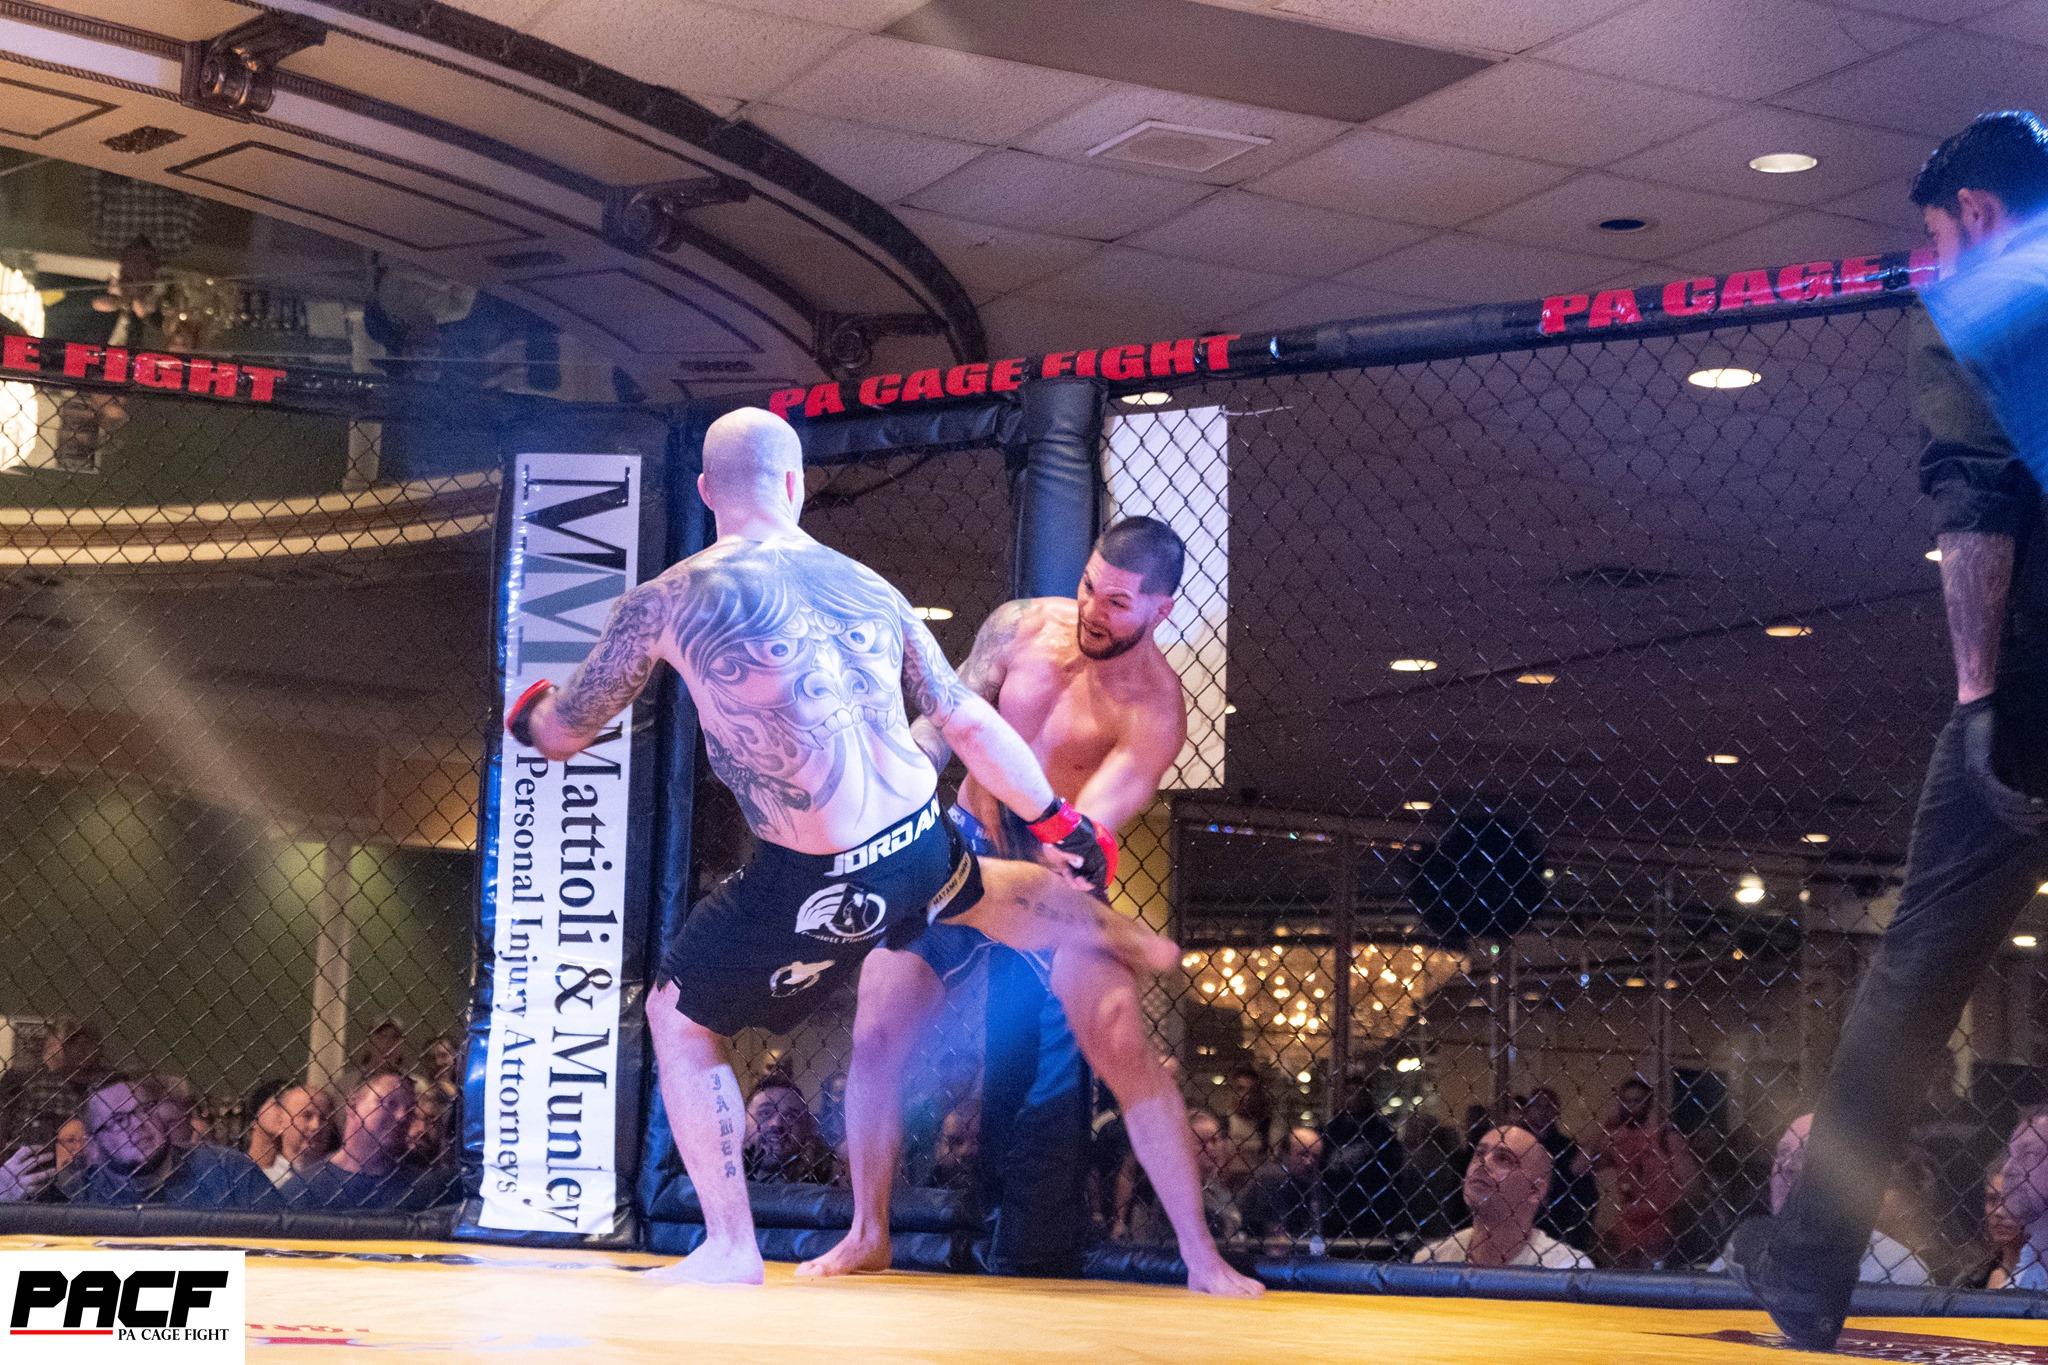 Jimmy Jordan chops the leg of Rick Nuno - PA Cage Fight 34 - Photo by LSS Photography